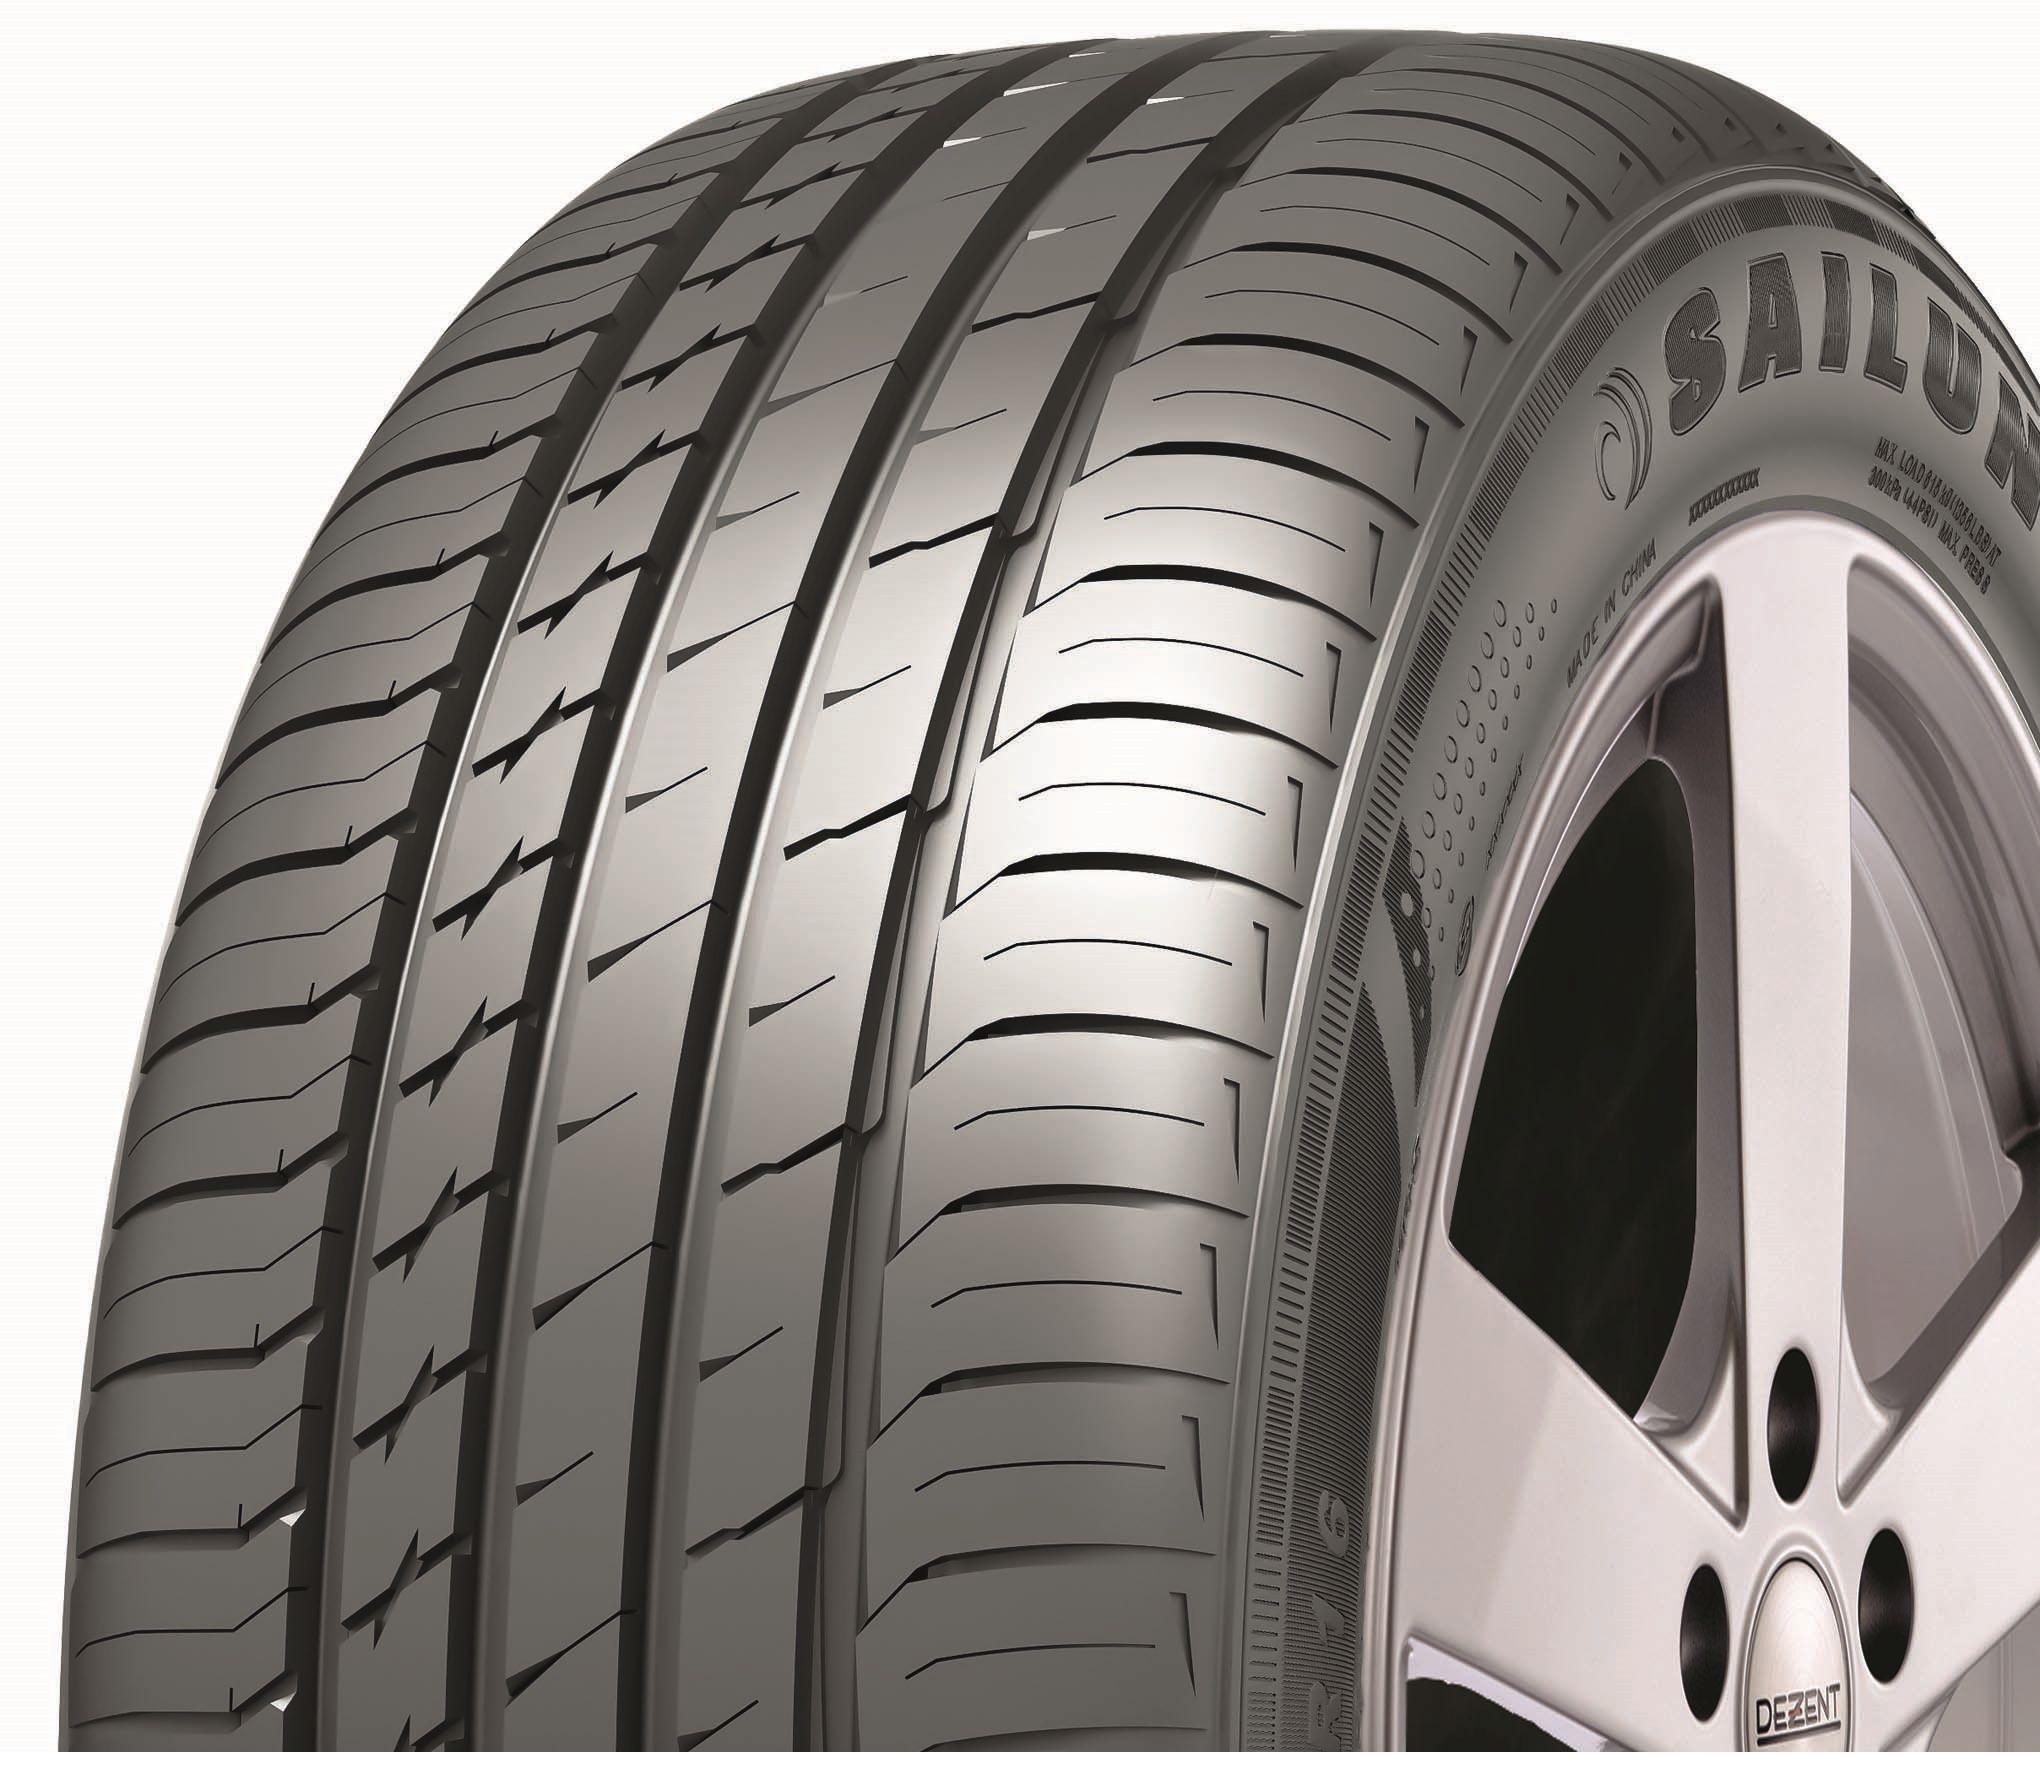 SAILUN atrezzo elite 225/55 R16 99V TL XL FP BSW, letní pneu, osobní a SUV